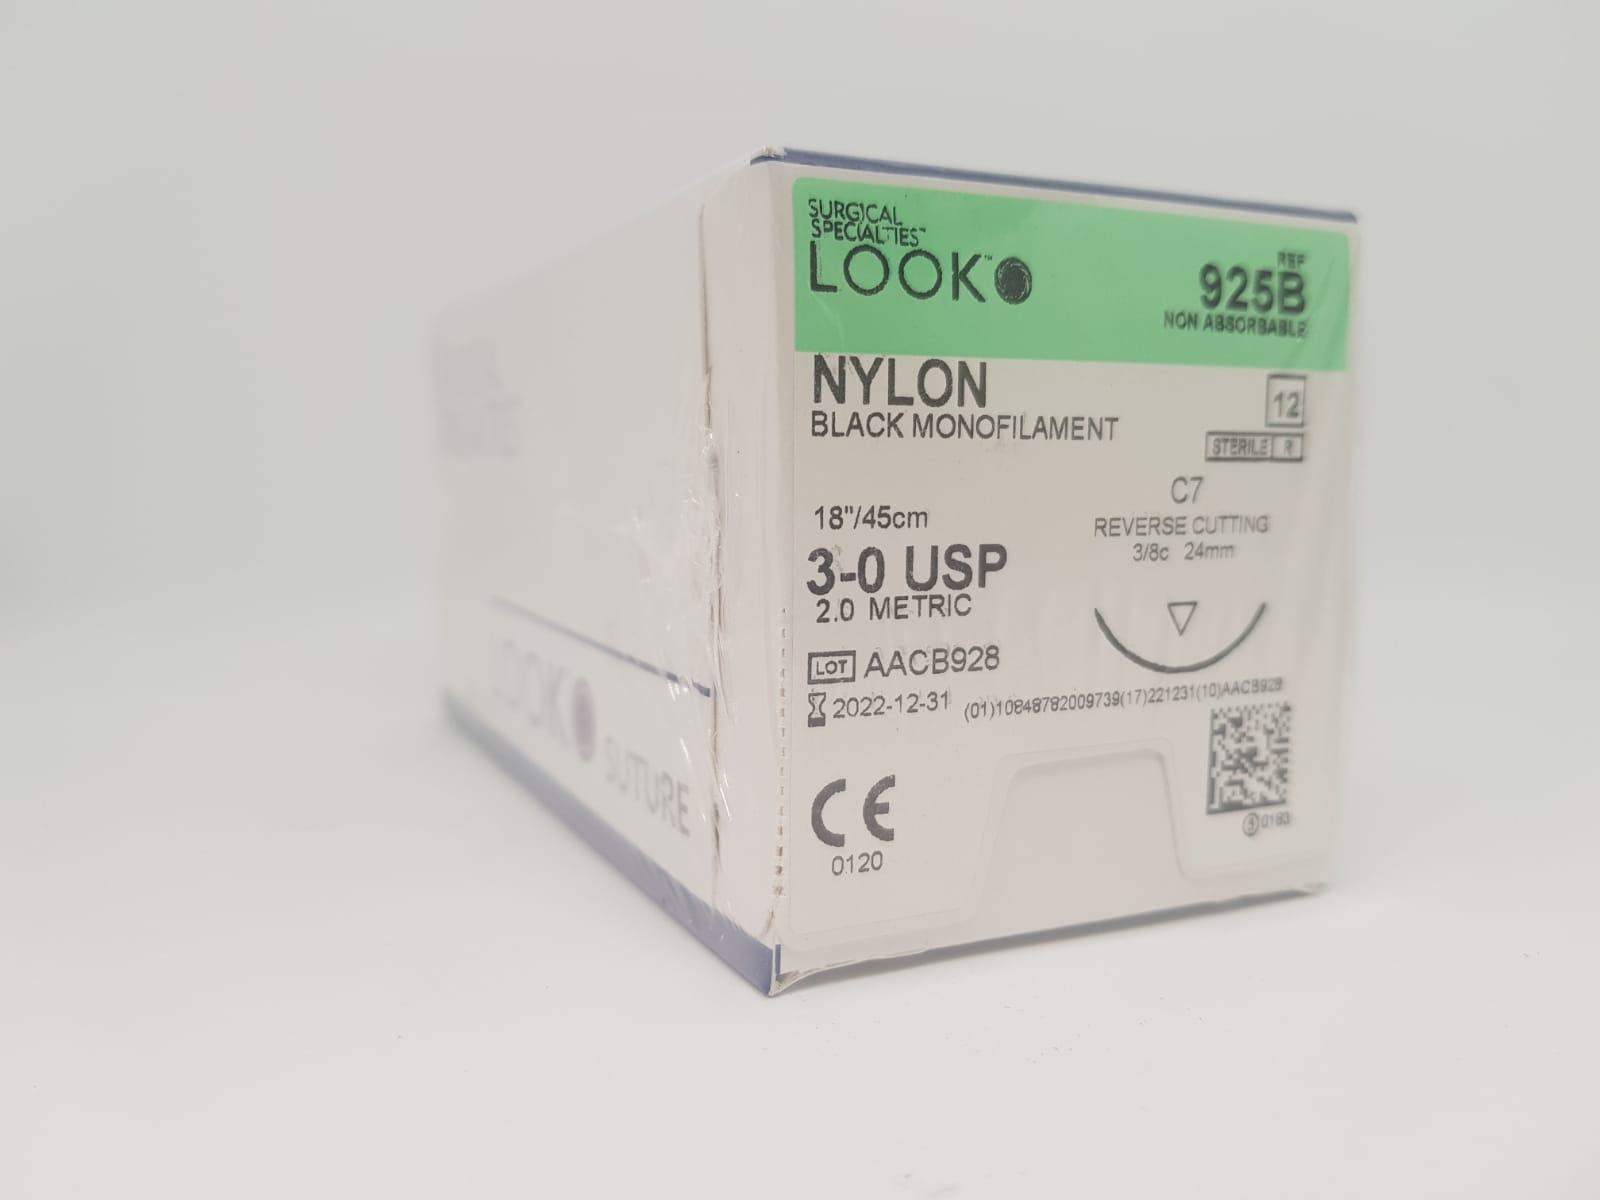 SS LOOK NYLON SUTURE 3/0 24MM 45CM BOX 12